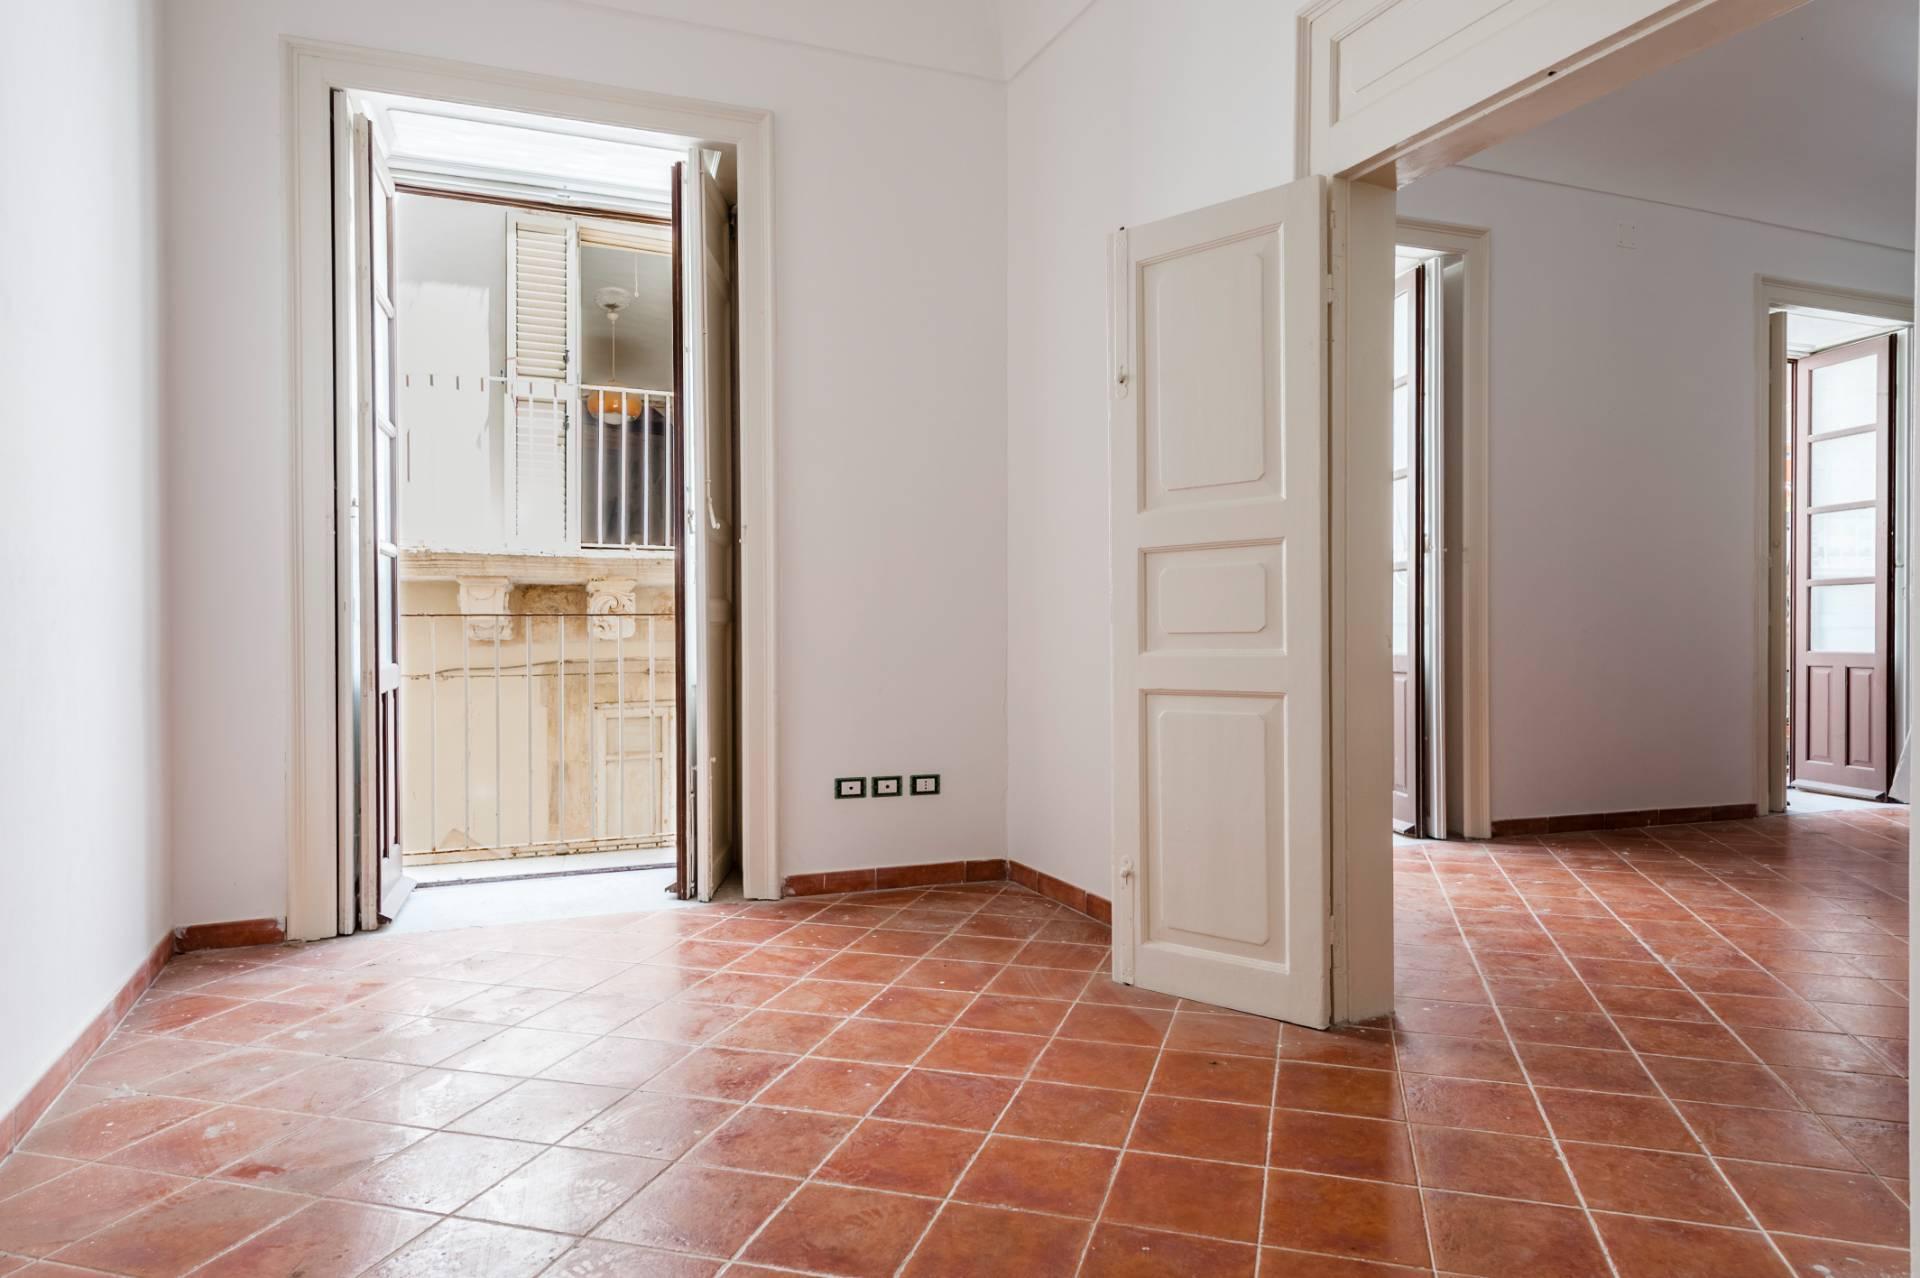 Palazzo in Vendita a Siracusa: 5 locali, 500 mq - Foto 14